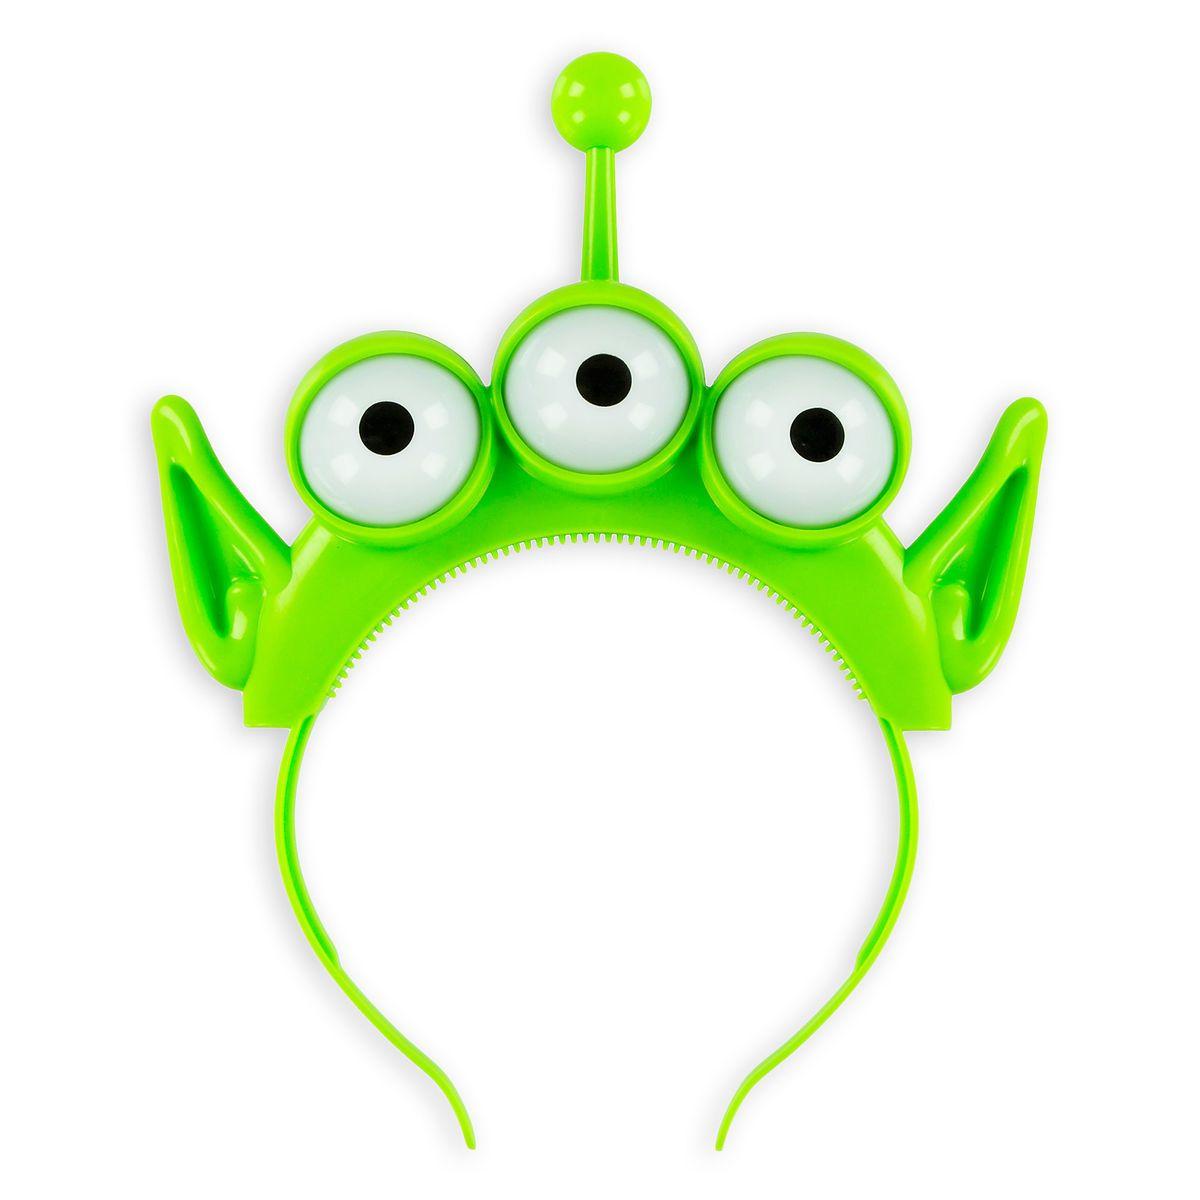 bcdf99ca2 Toy Story Alien Light-Up Headband in 2019 | Disney <3 | Toy story ...